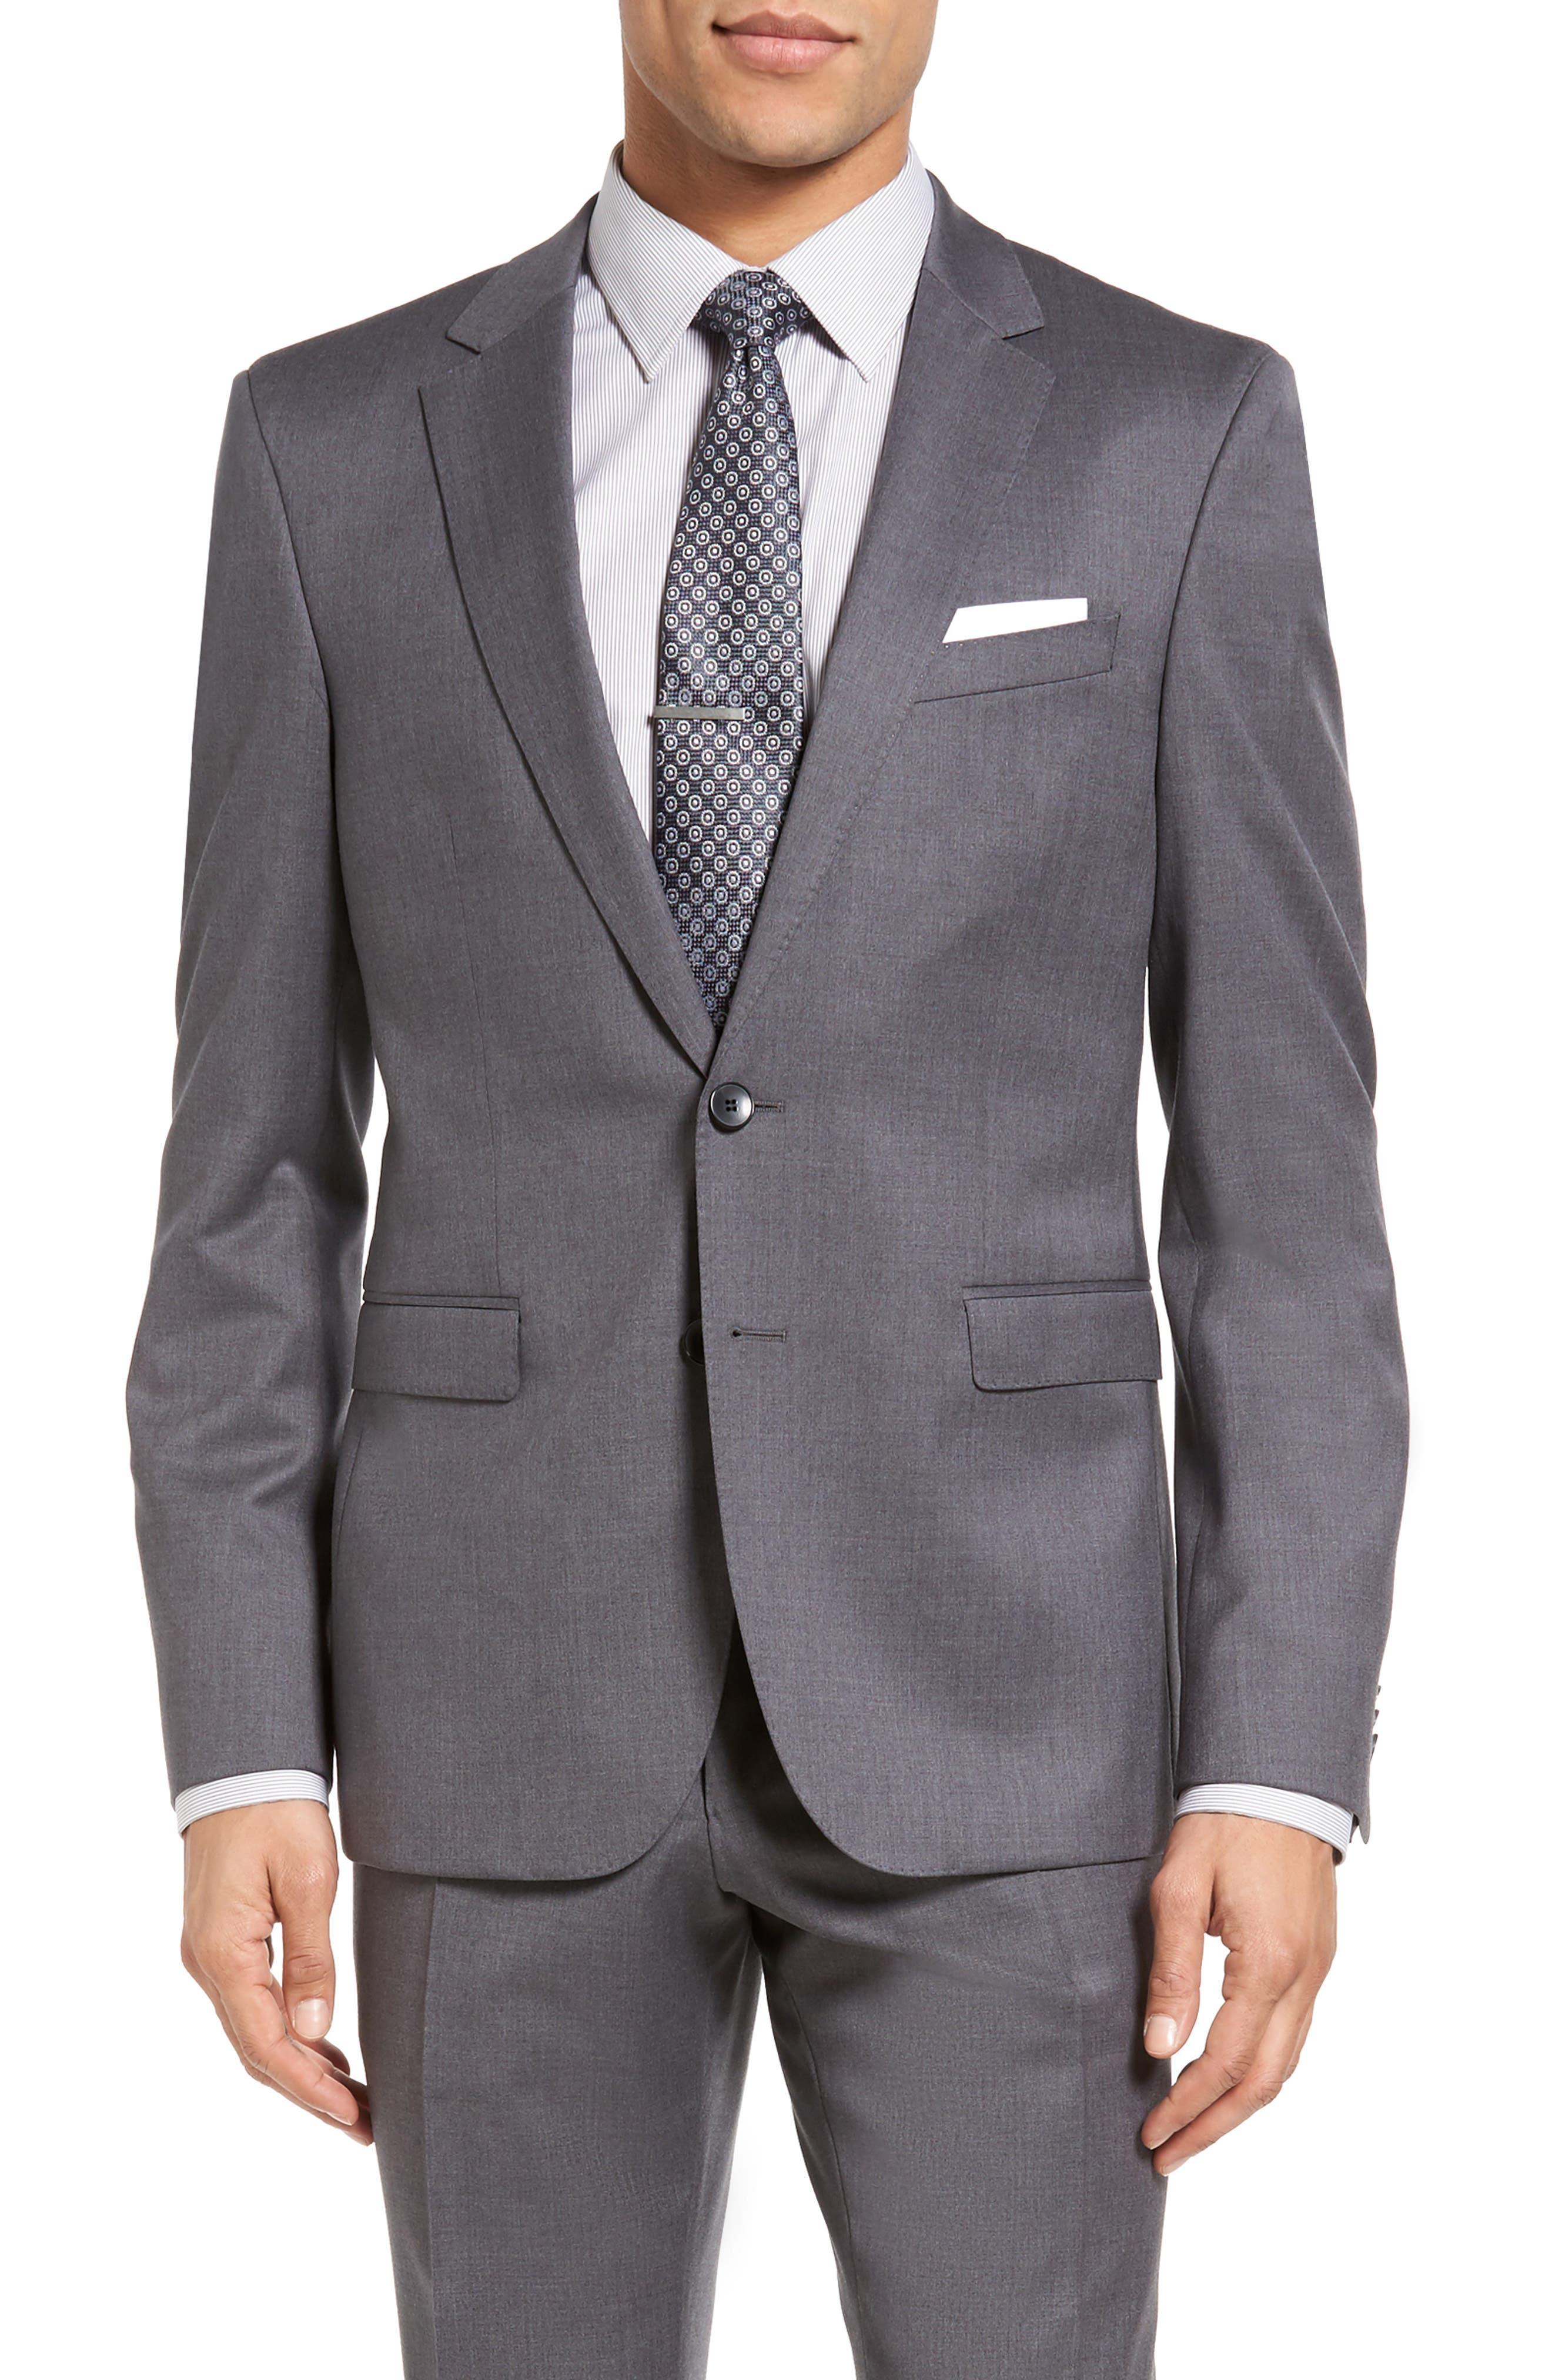 Alternate Image 2  - BOSS Ryan/Win Trim Fit Solid Wool Suit